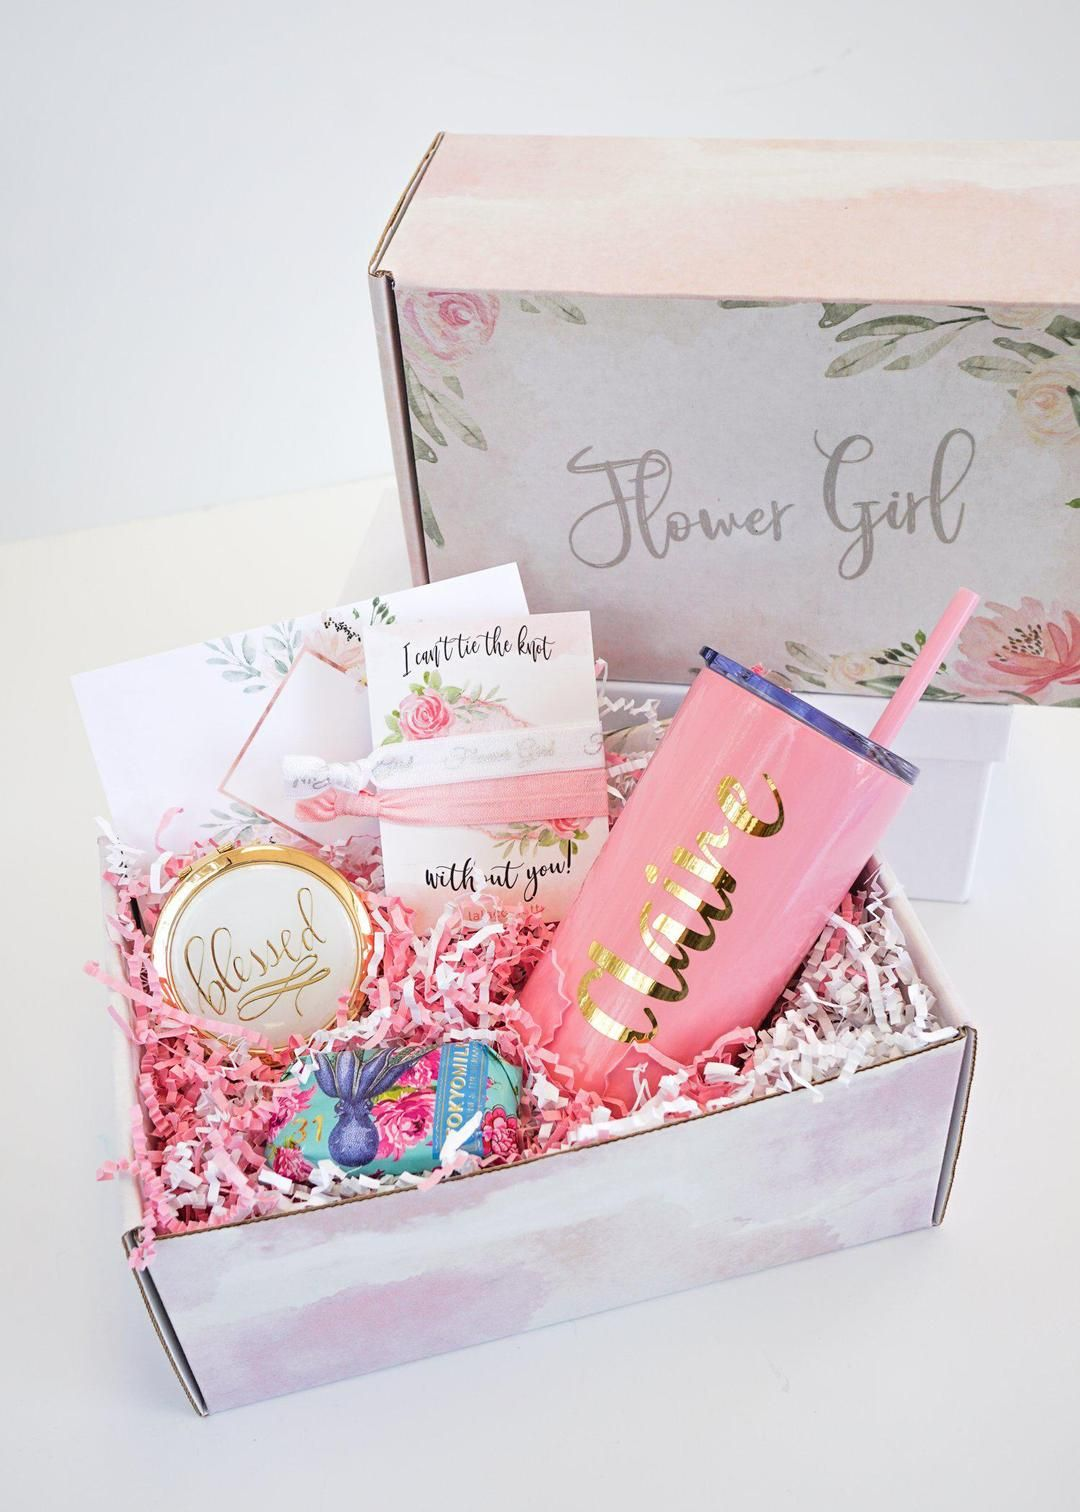 Flower girl proposal box in 2020 flower girl proposal